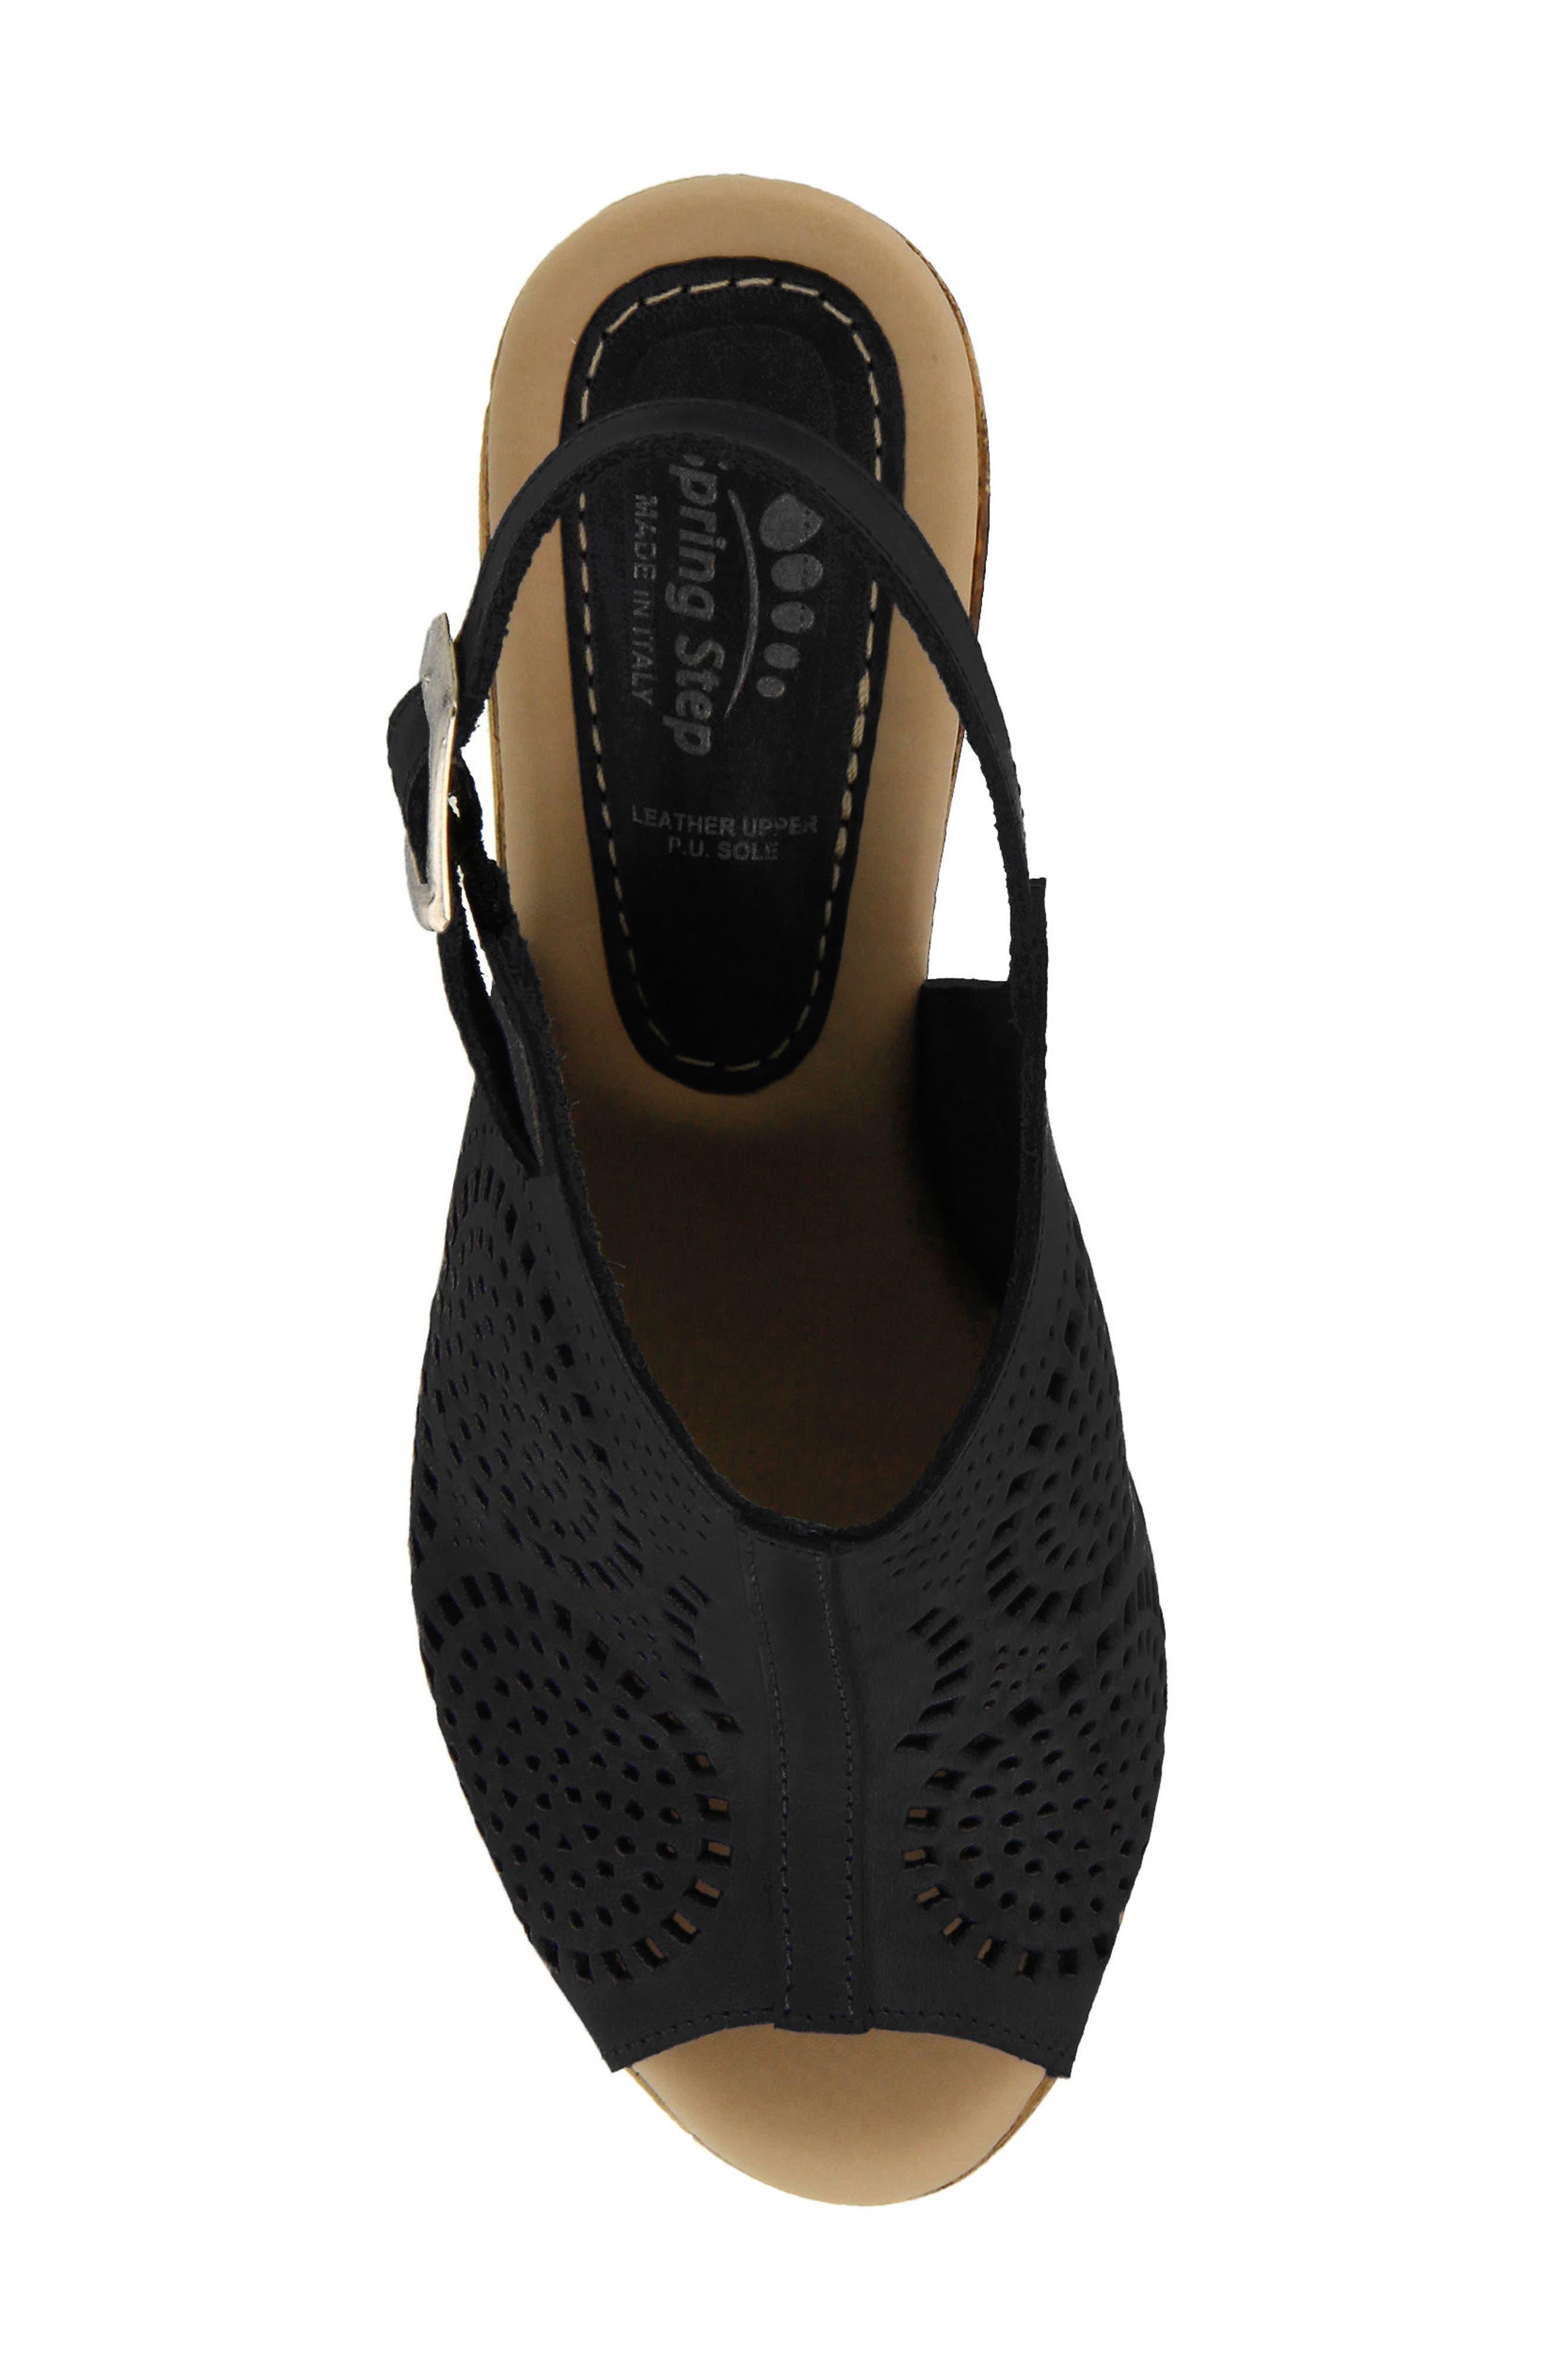 Liberty Platform Sandal,                             Alternate thumbnail 4, color,                             Black Leather